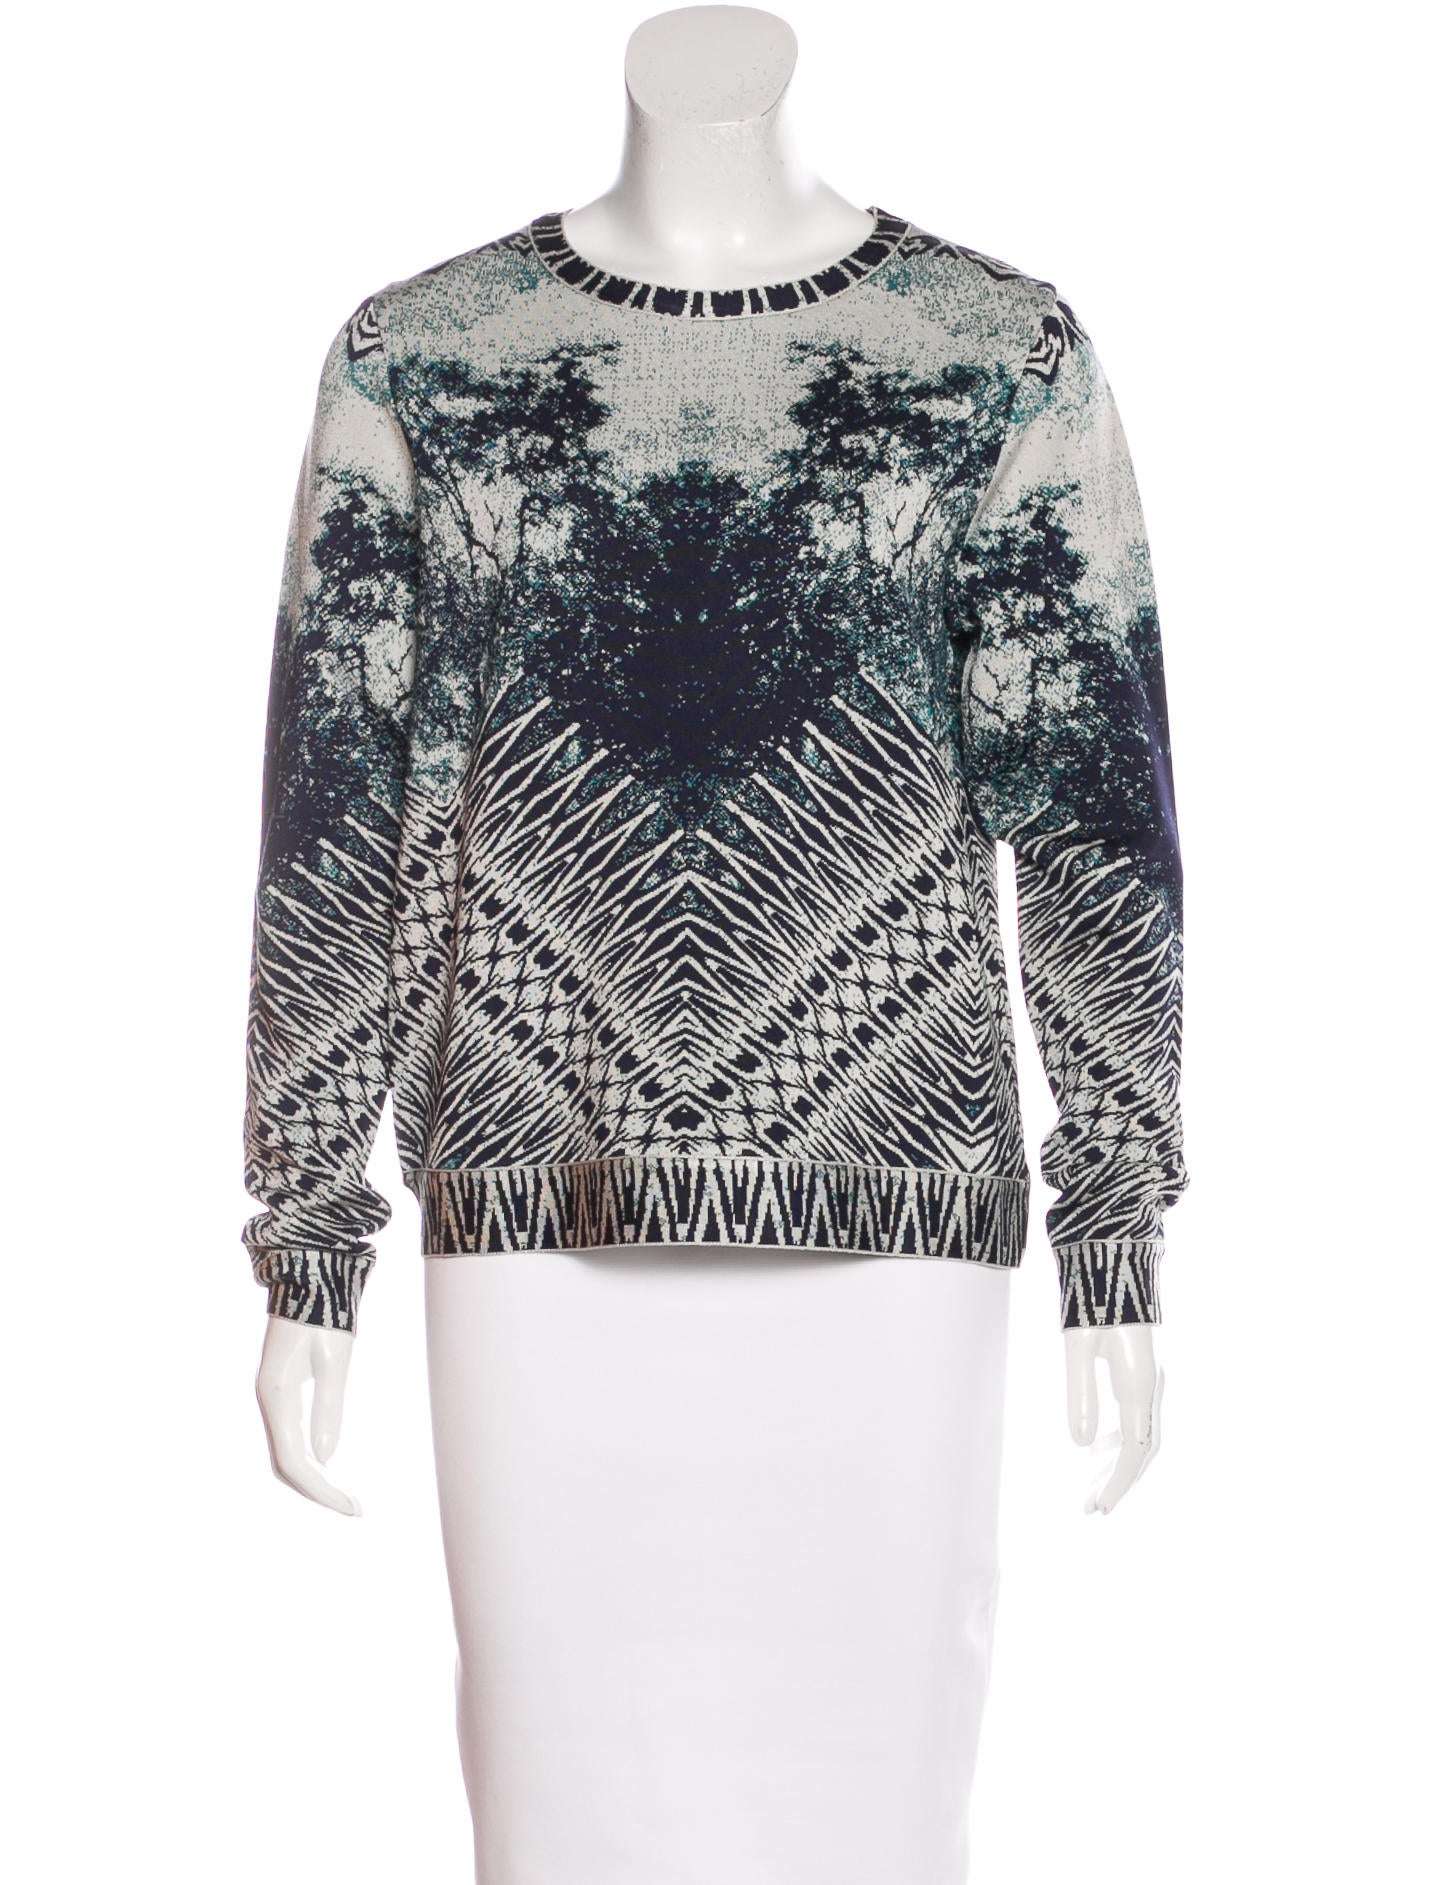 Herve Leger Ronja Jacquard Sweater - Clothing